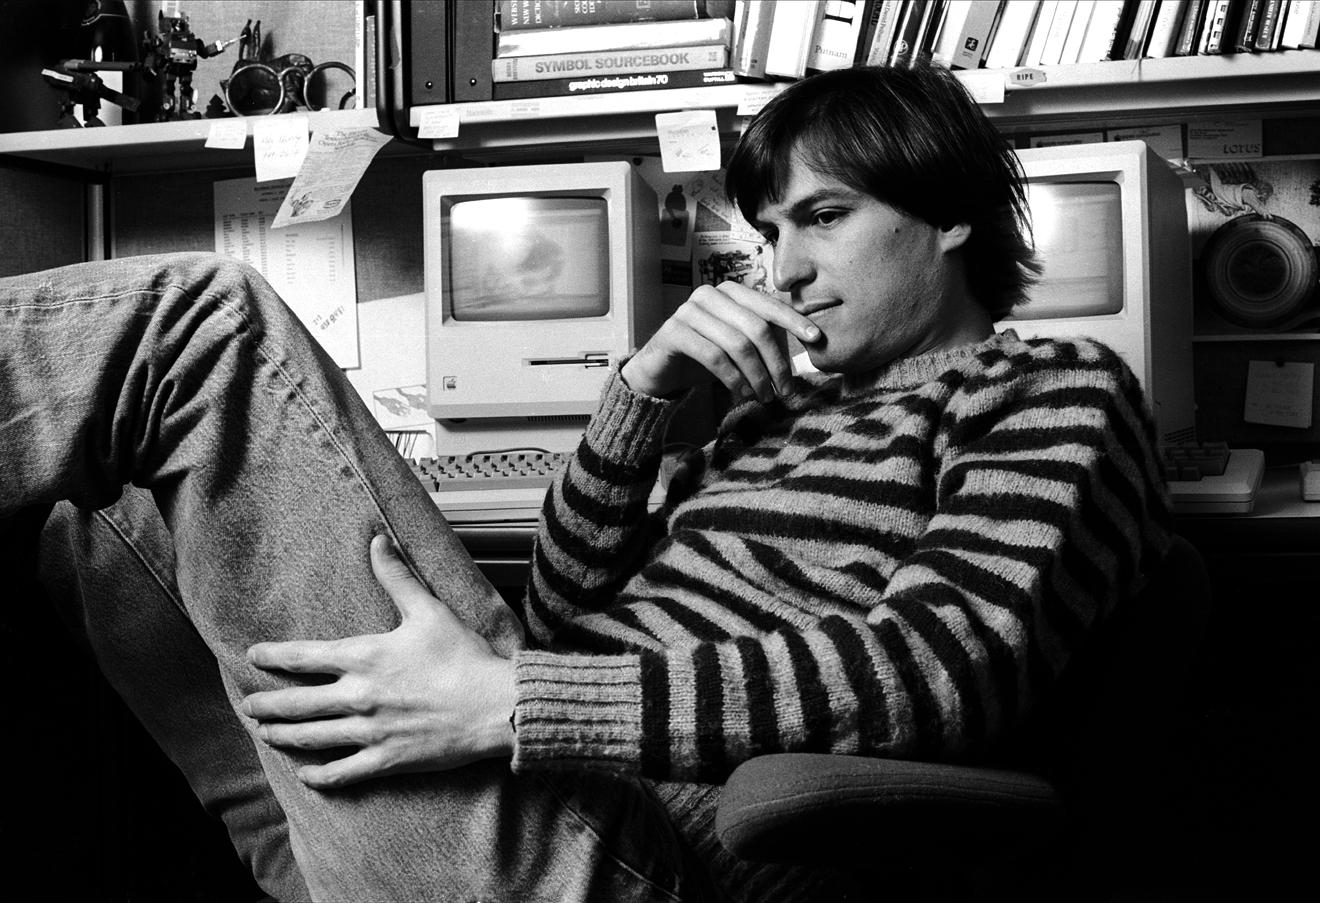 1984_steve_jobs_photo5